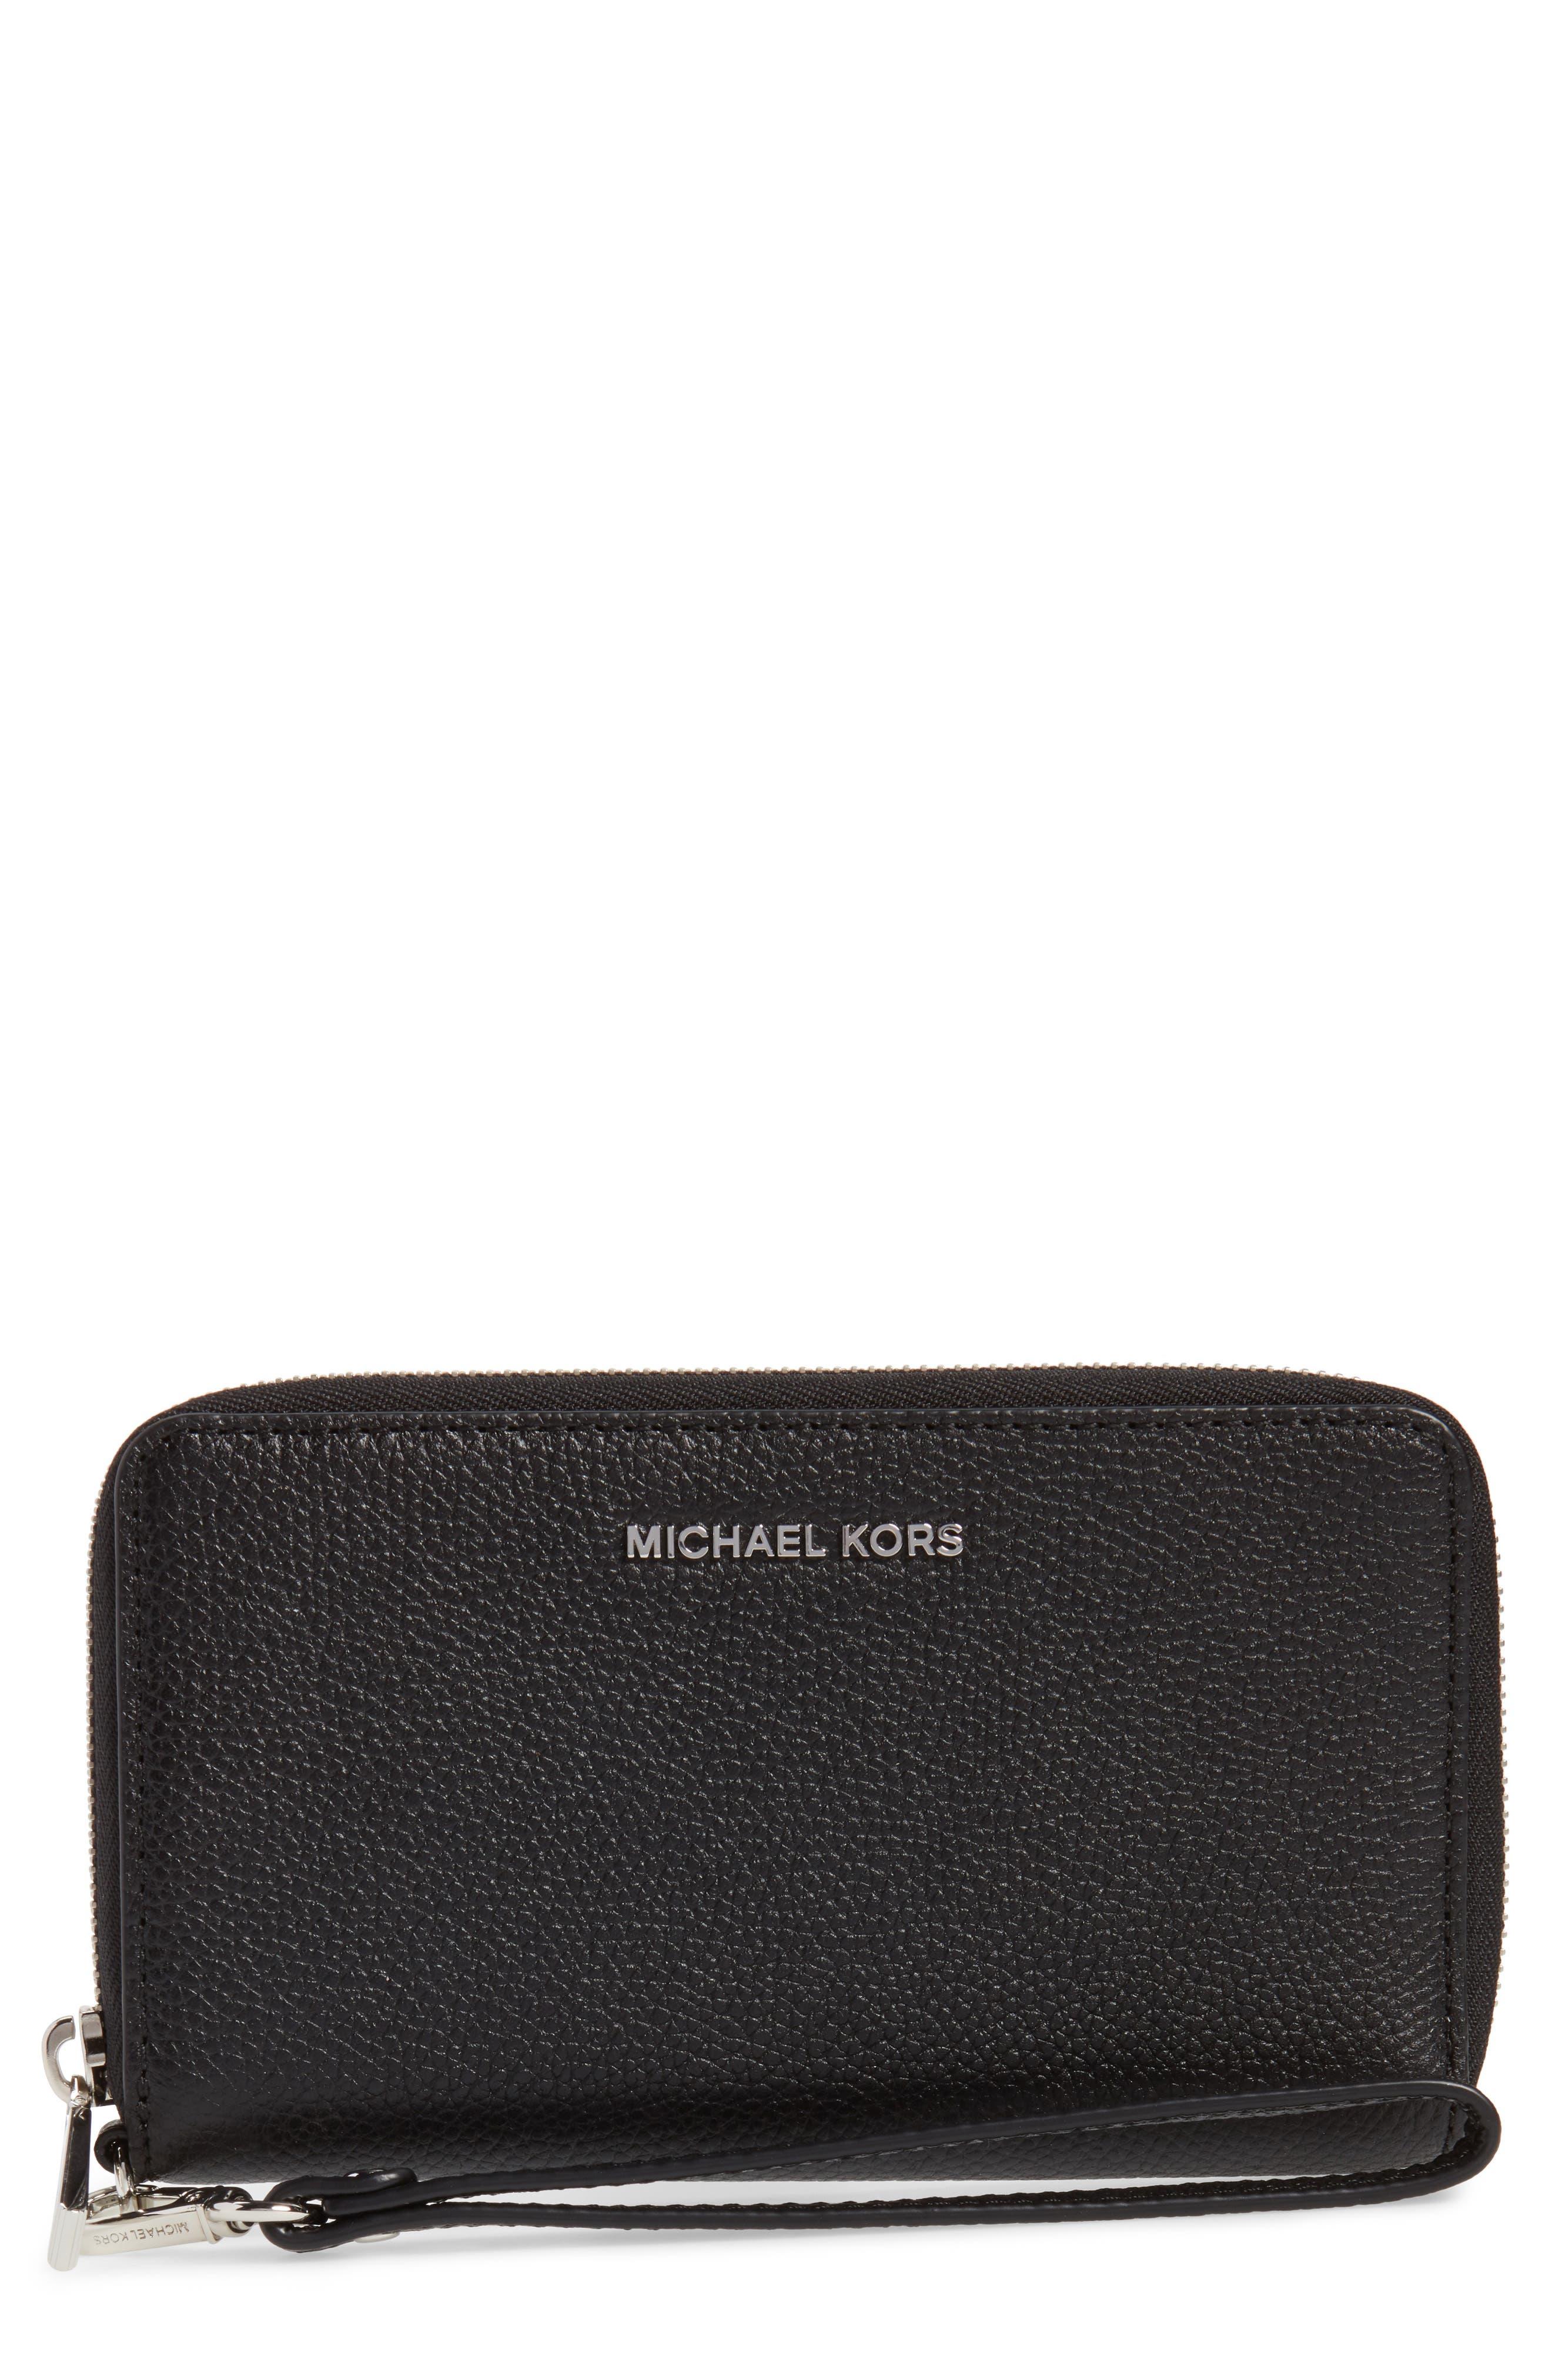 Mercer Large Leather Wristlet,                             Main thumbnail 1, color,